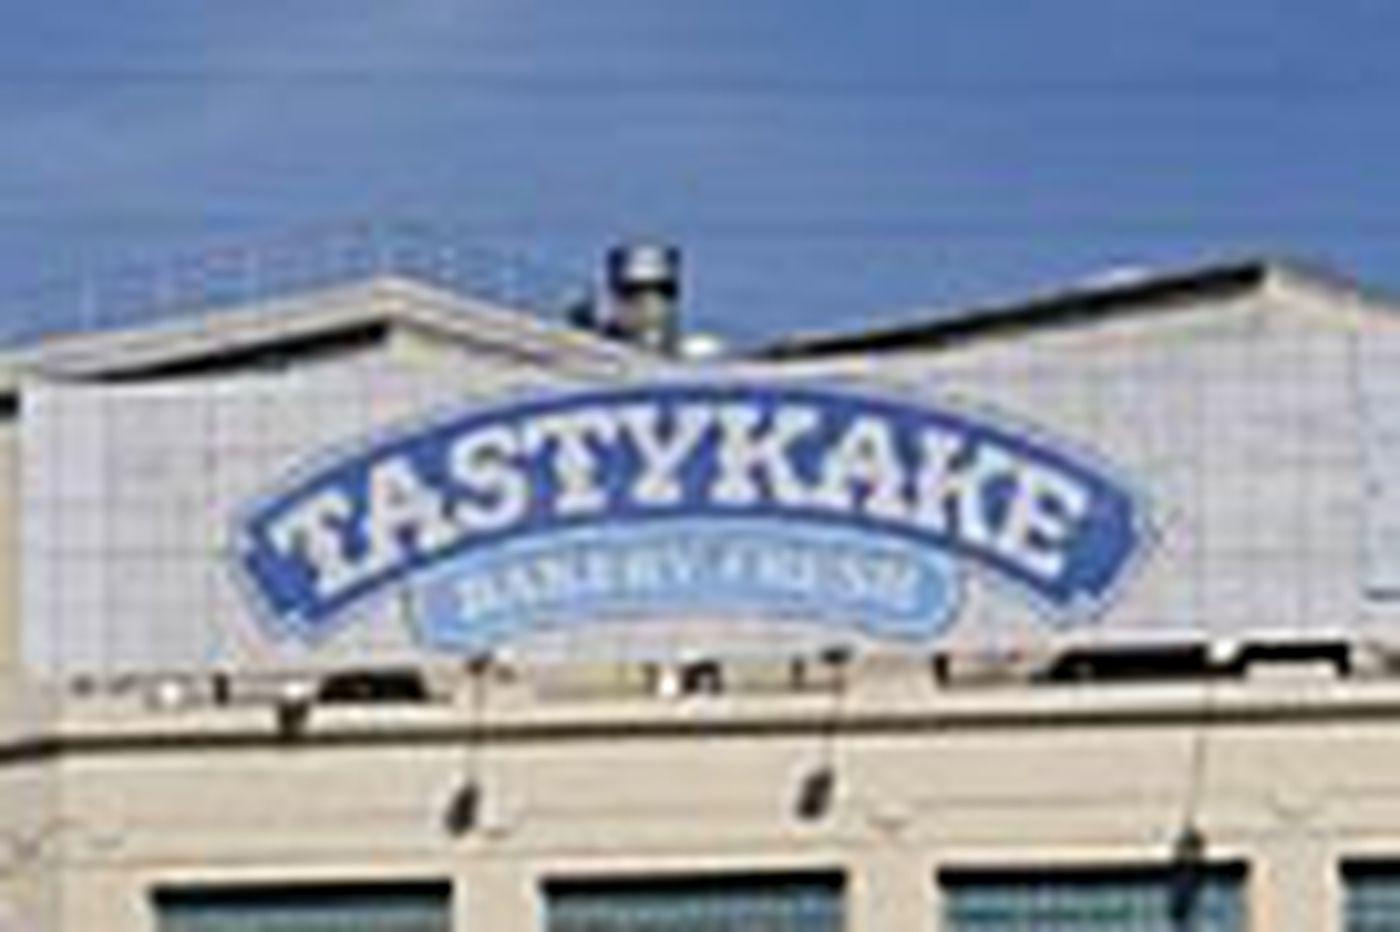 Tasty Baking to sell Nicetown properties